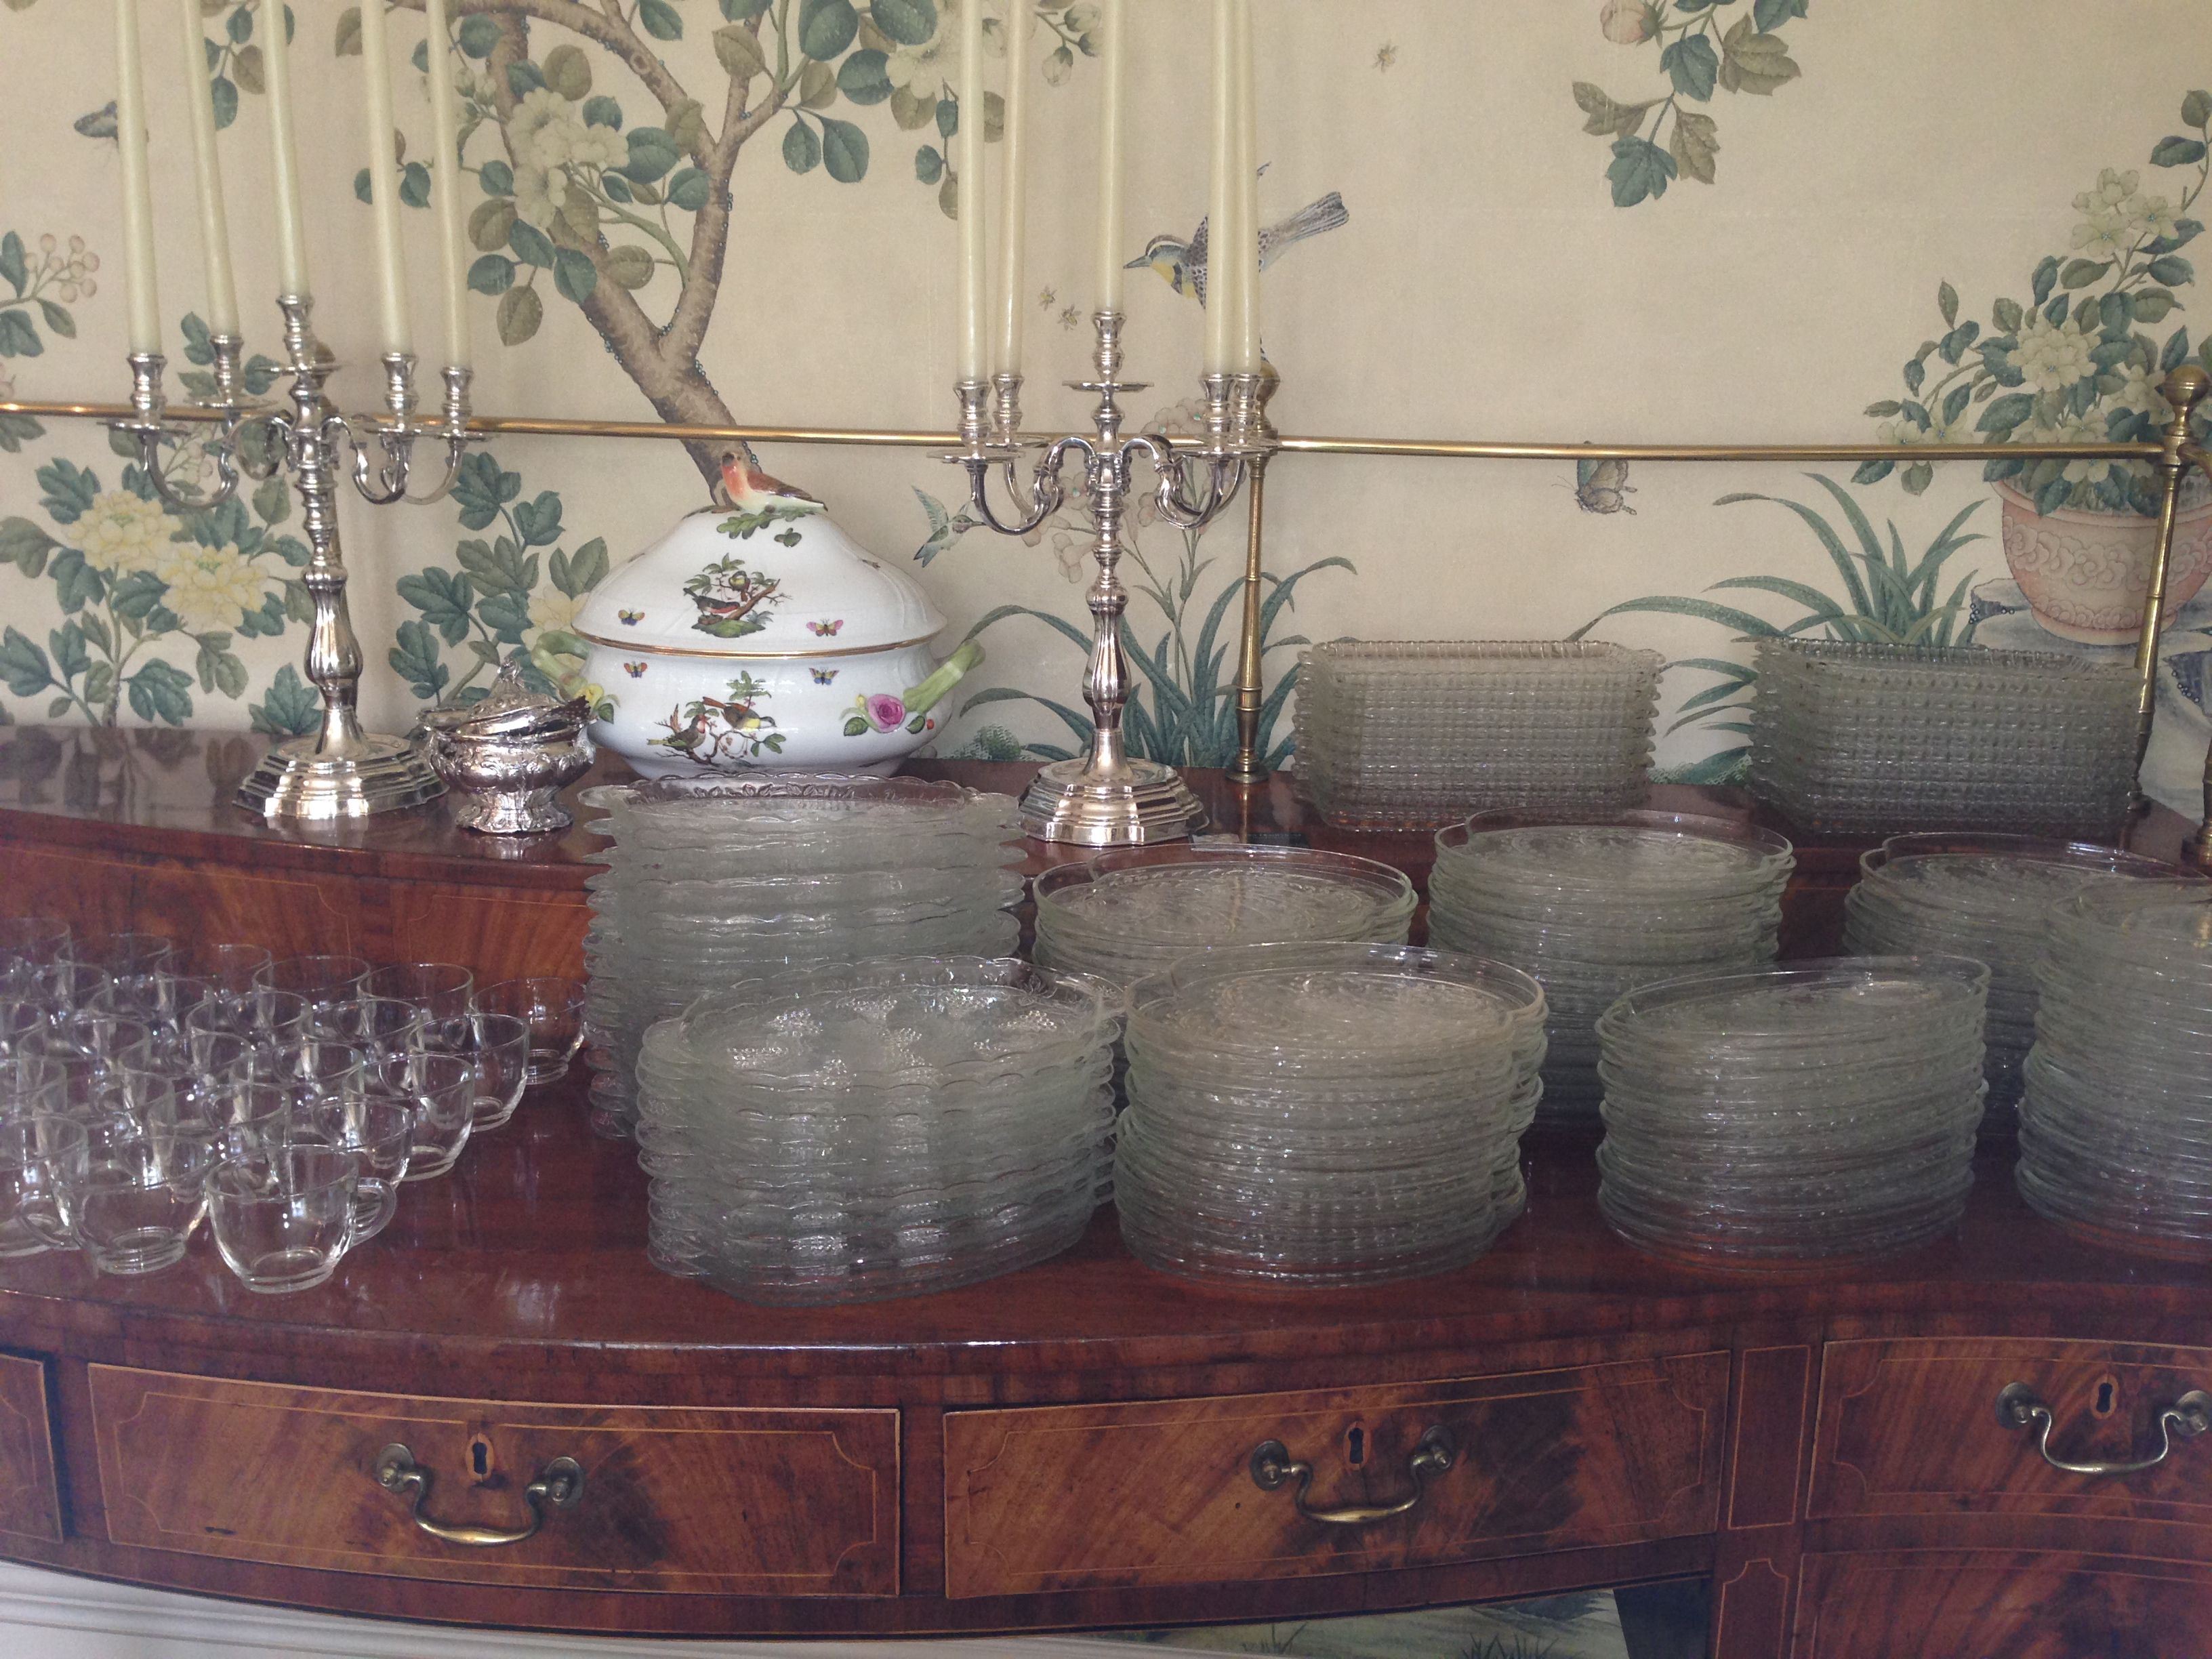 ~ Buffet Table ~ #TeaParty #EnglishTea #tea #BoneChina #silver #antique #elegant #antique #catering #TeaTraditions #buffet www.ttraditions.com